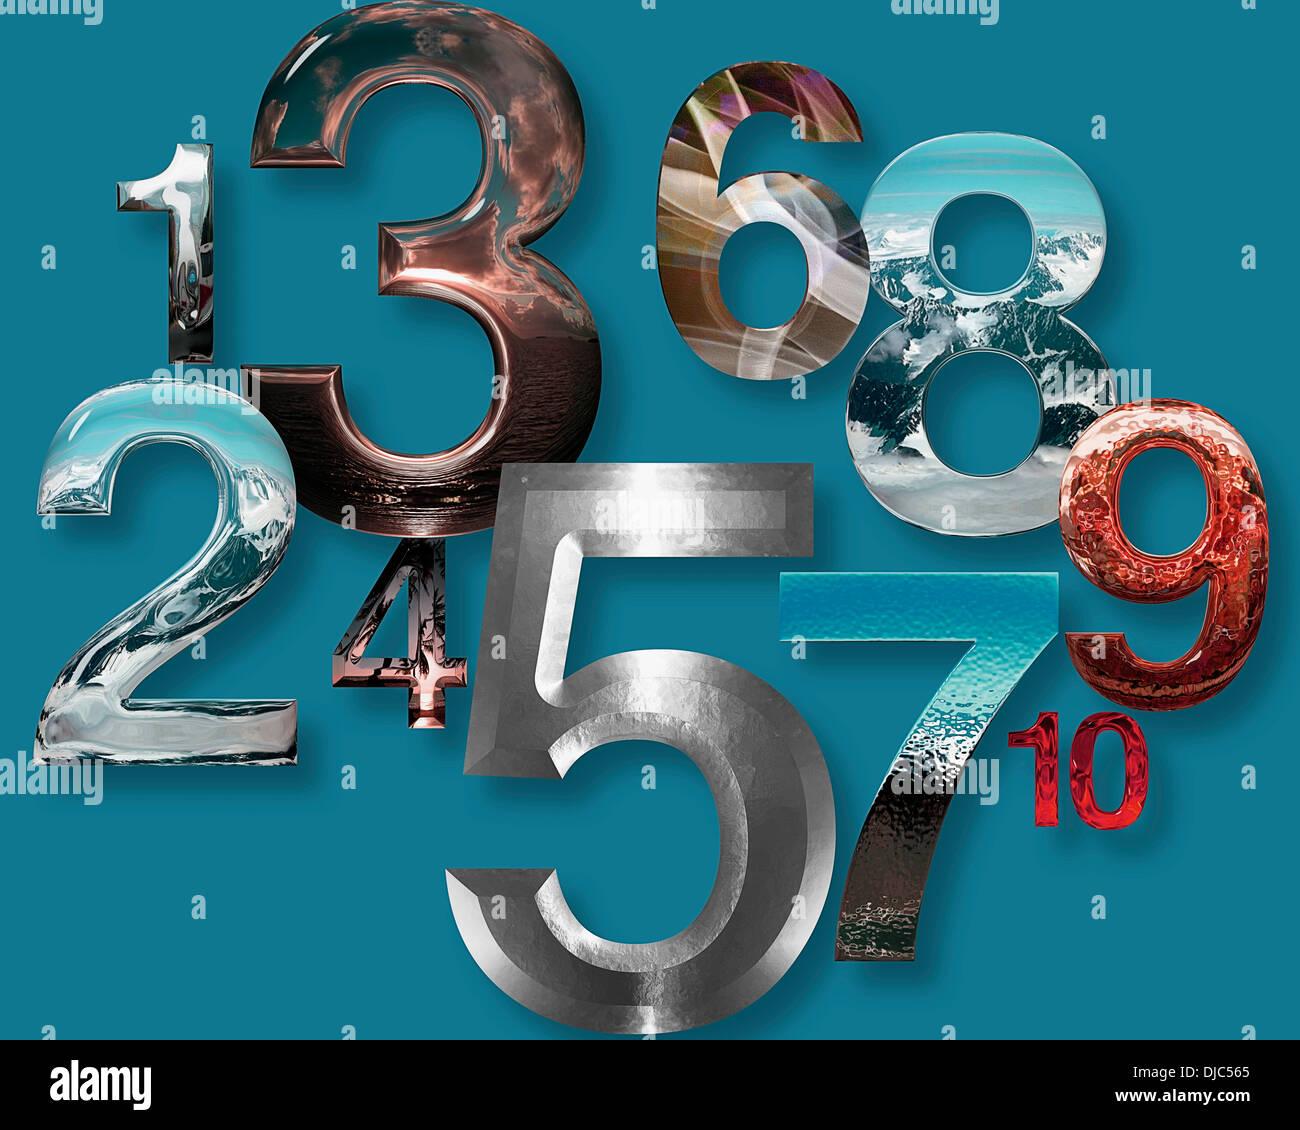 Grafikdesign: Numb3rs Stockbild